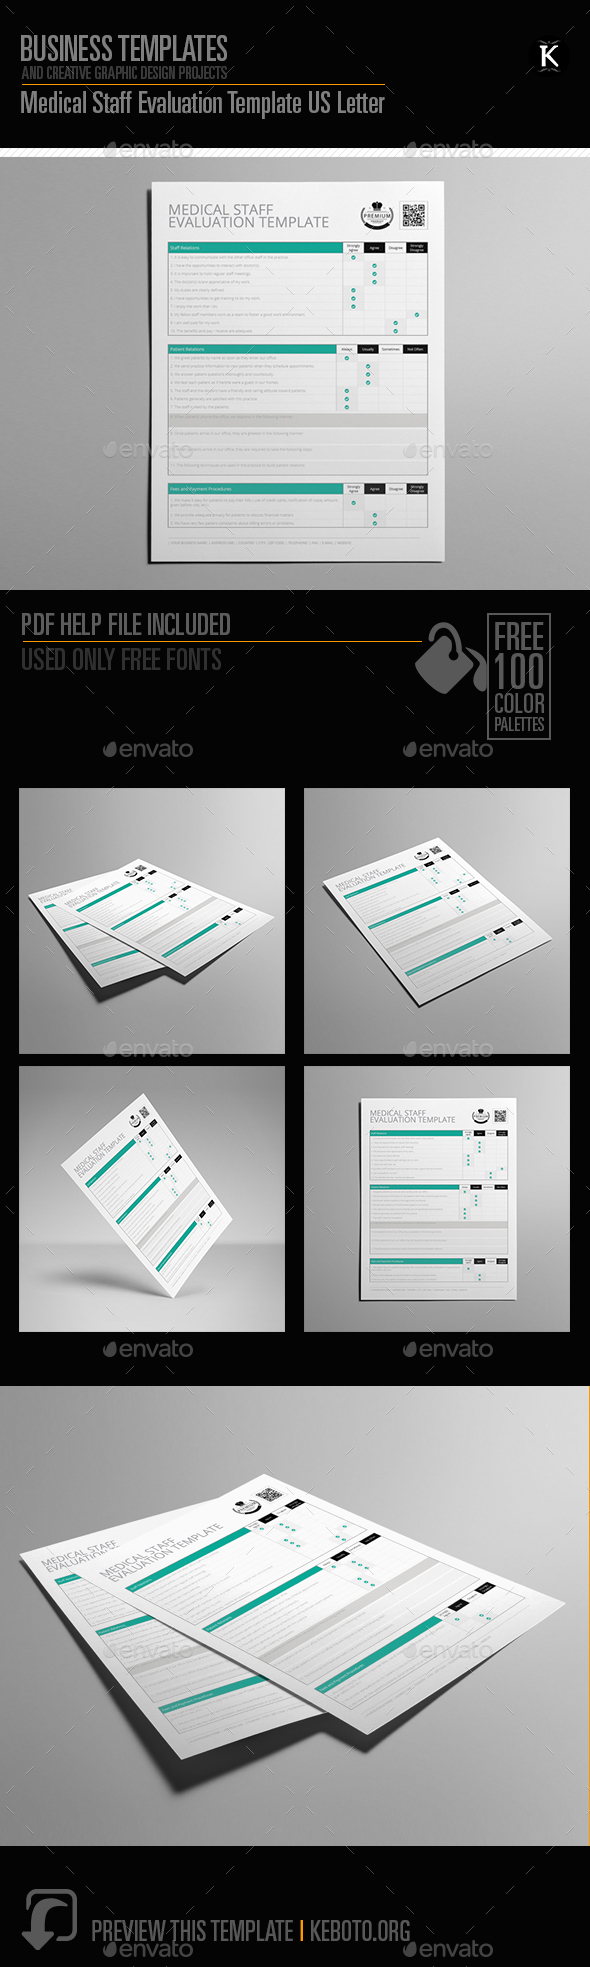 Questionnaire Template Graphics Designs u0026 Templates Medical